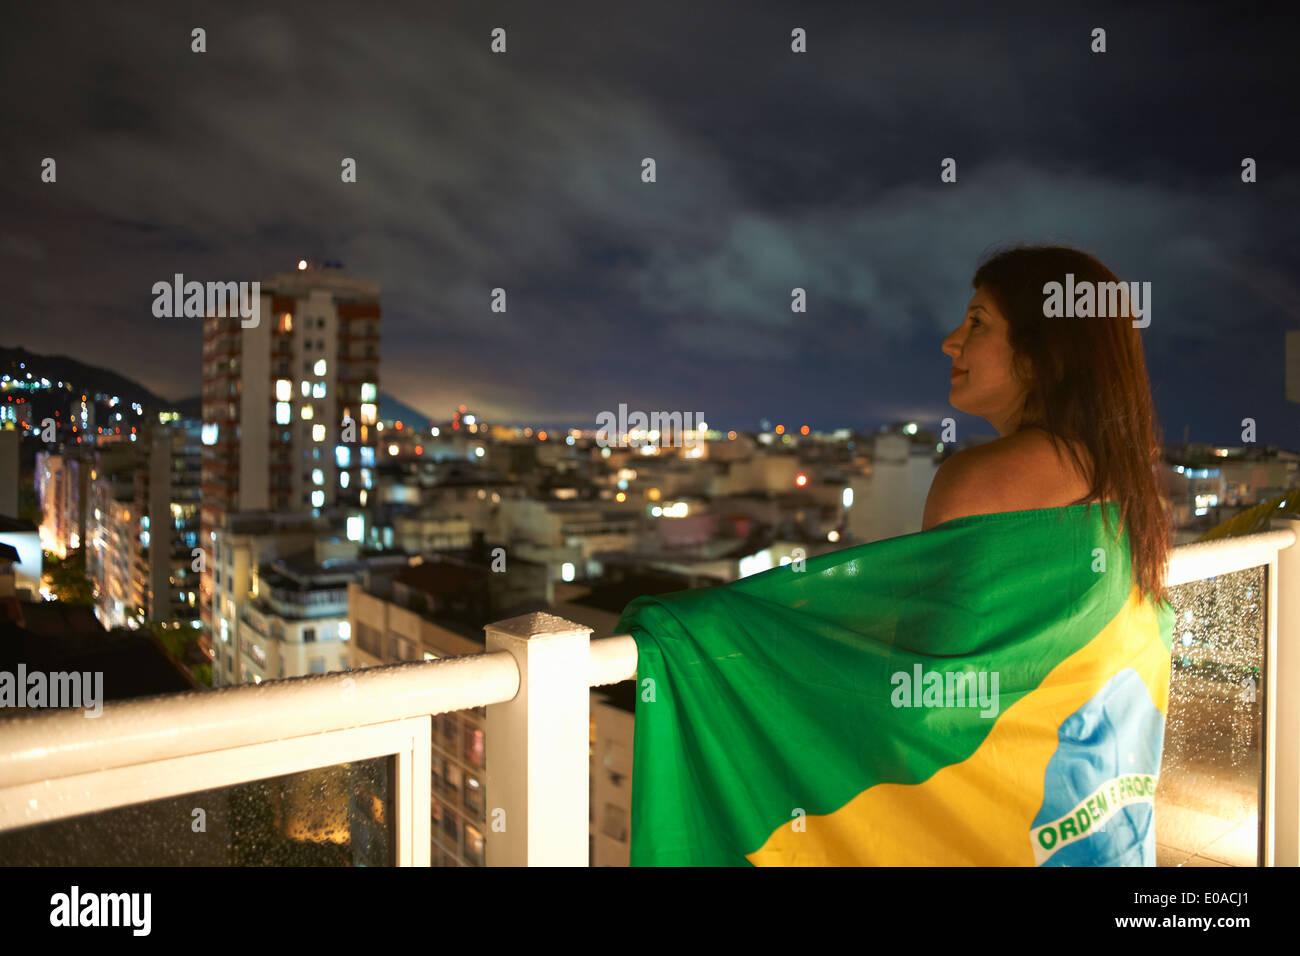 Mature woman gazing from balcony at night, Rio De Janeiro, Brazil - Stock Image